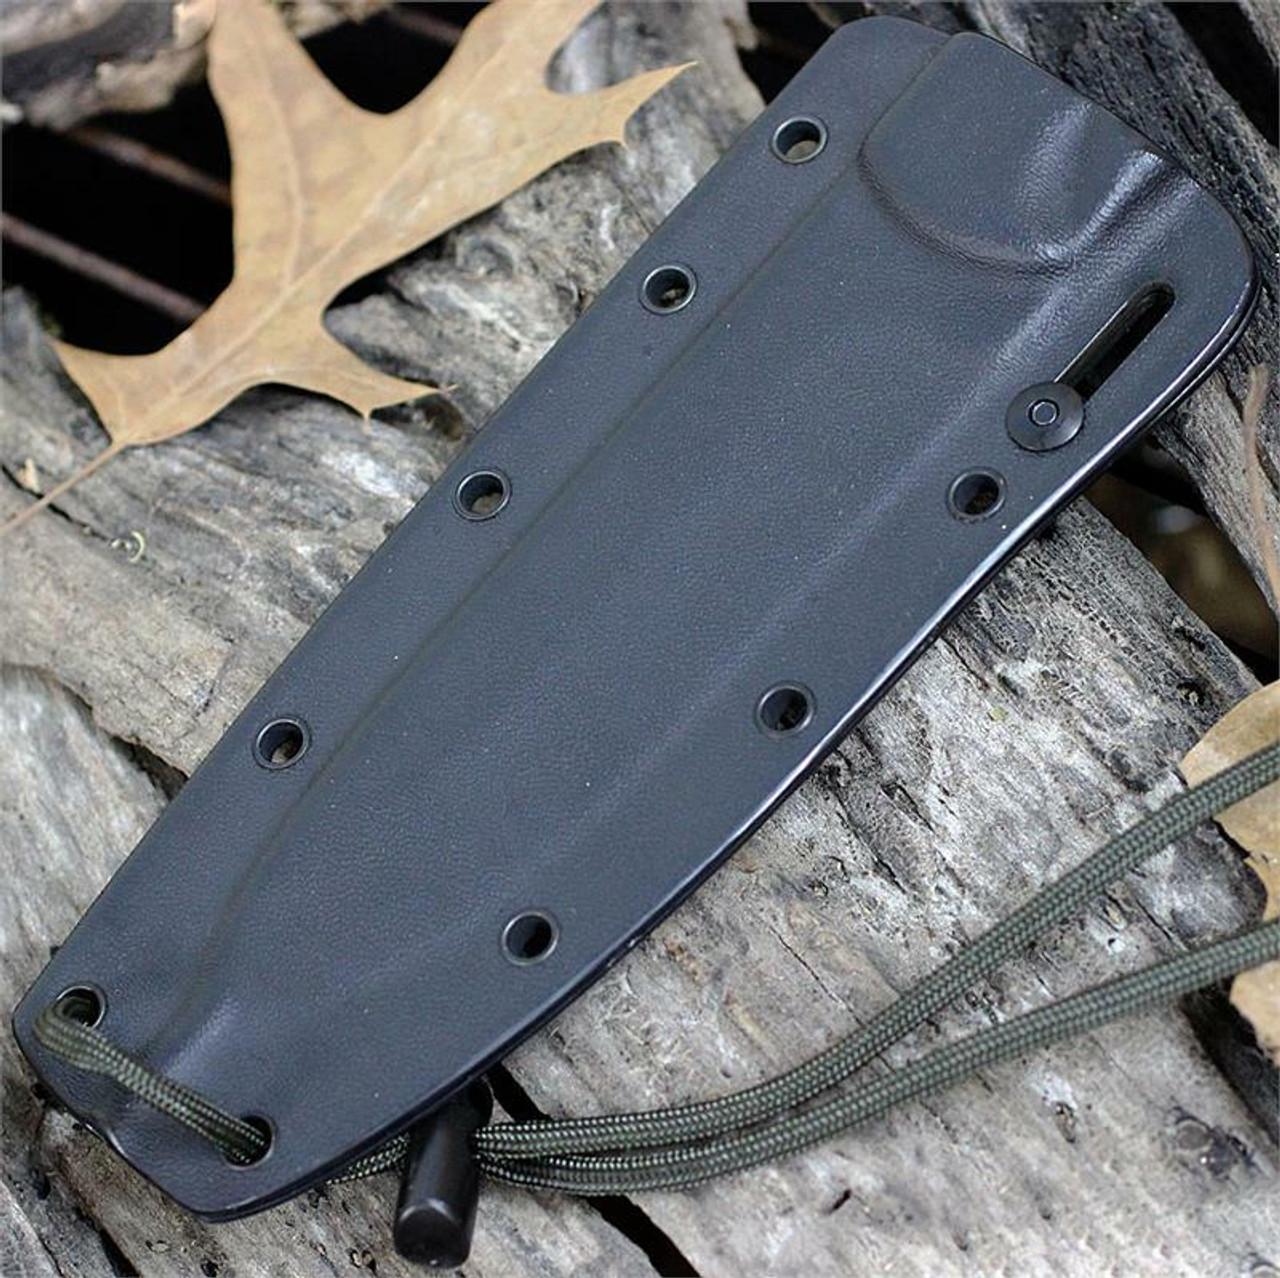 ESEE Knives Combat Tactical CM6-TG-M, Tactical Gray Plain Blade, Micarta Handle, Black Kydex Sheath and Clip Plate